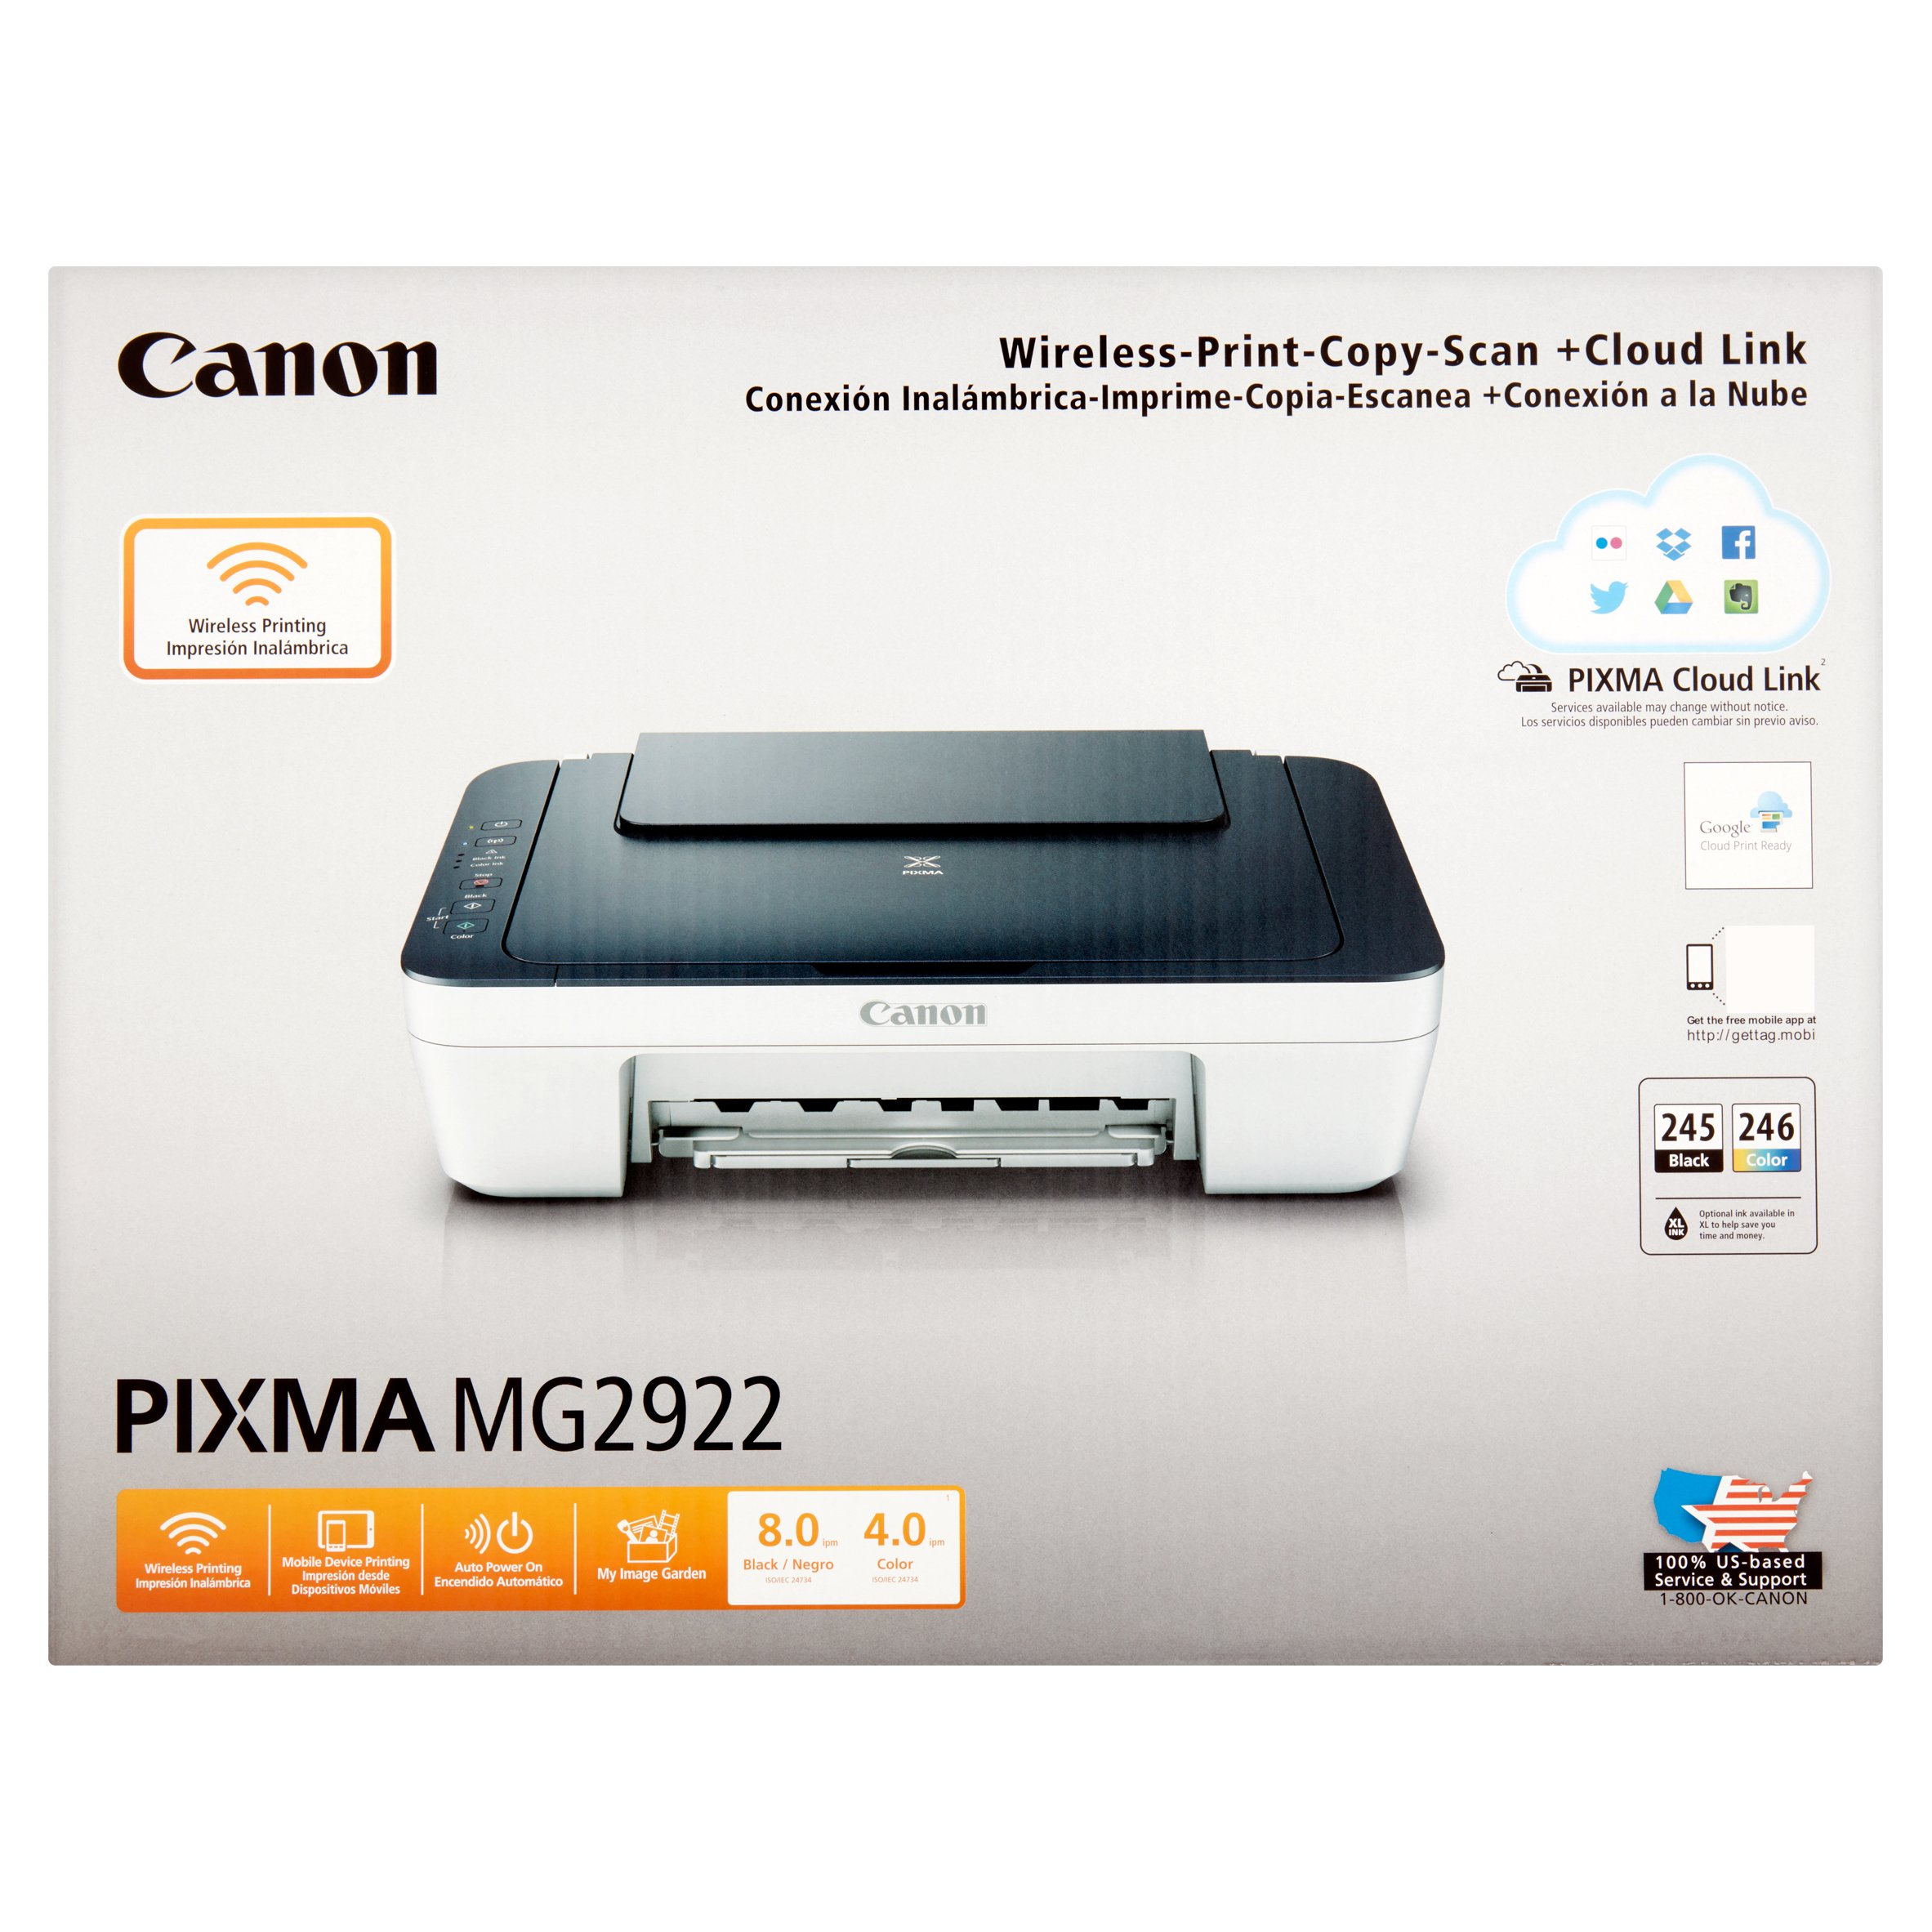 Canon PIXMA MG2922 Wireless-Print-Copy-Scan + Cloud Link